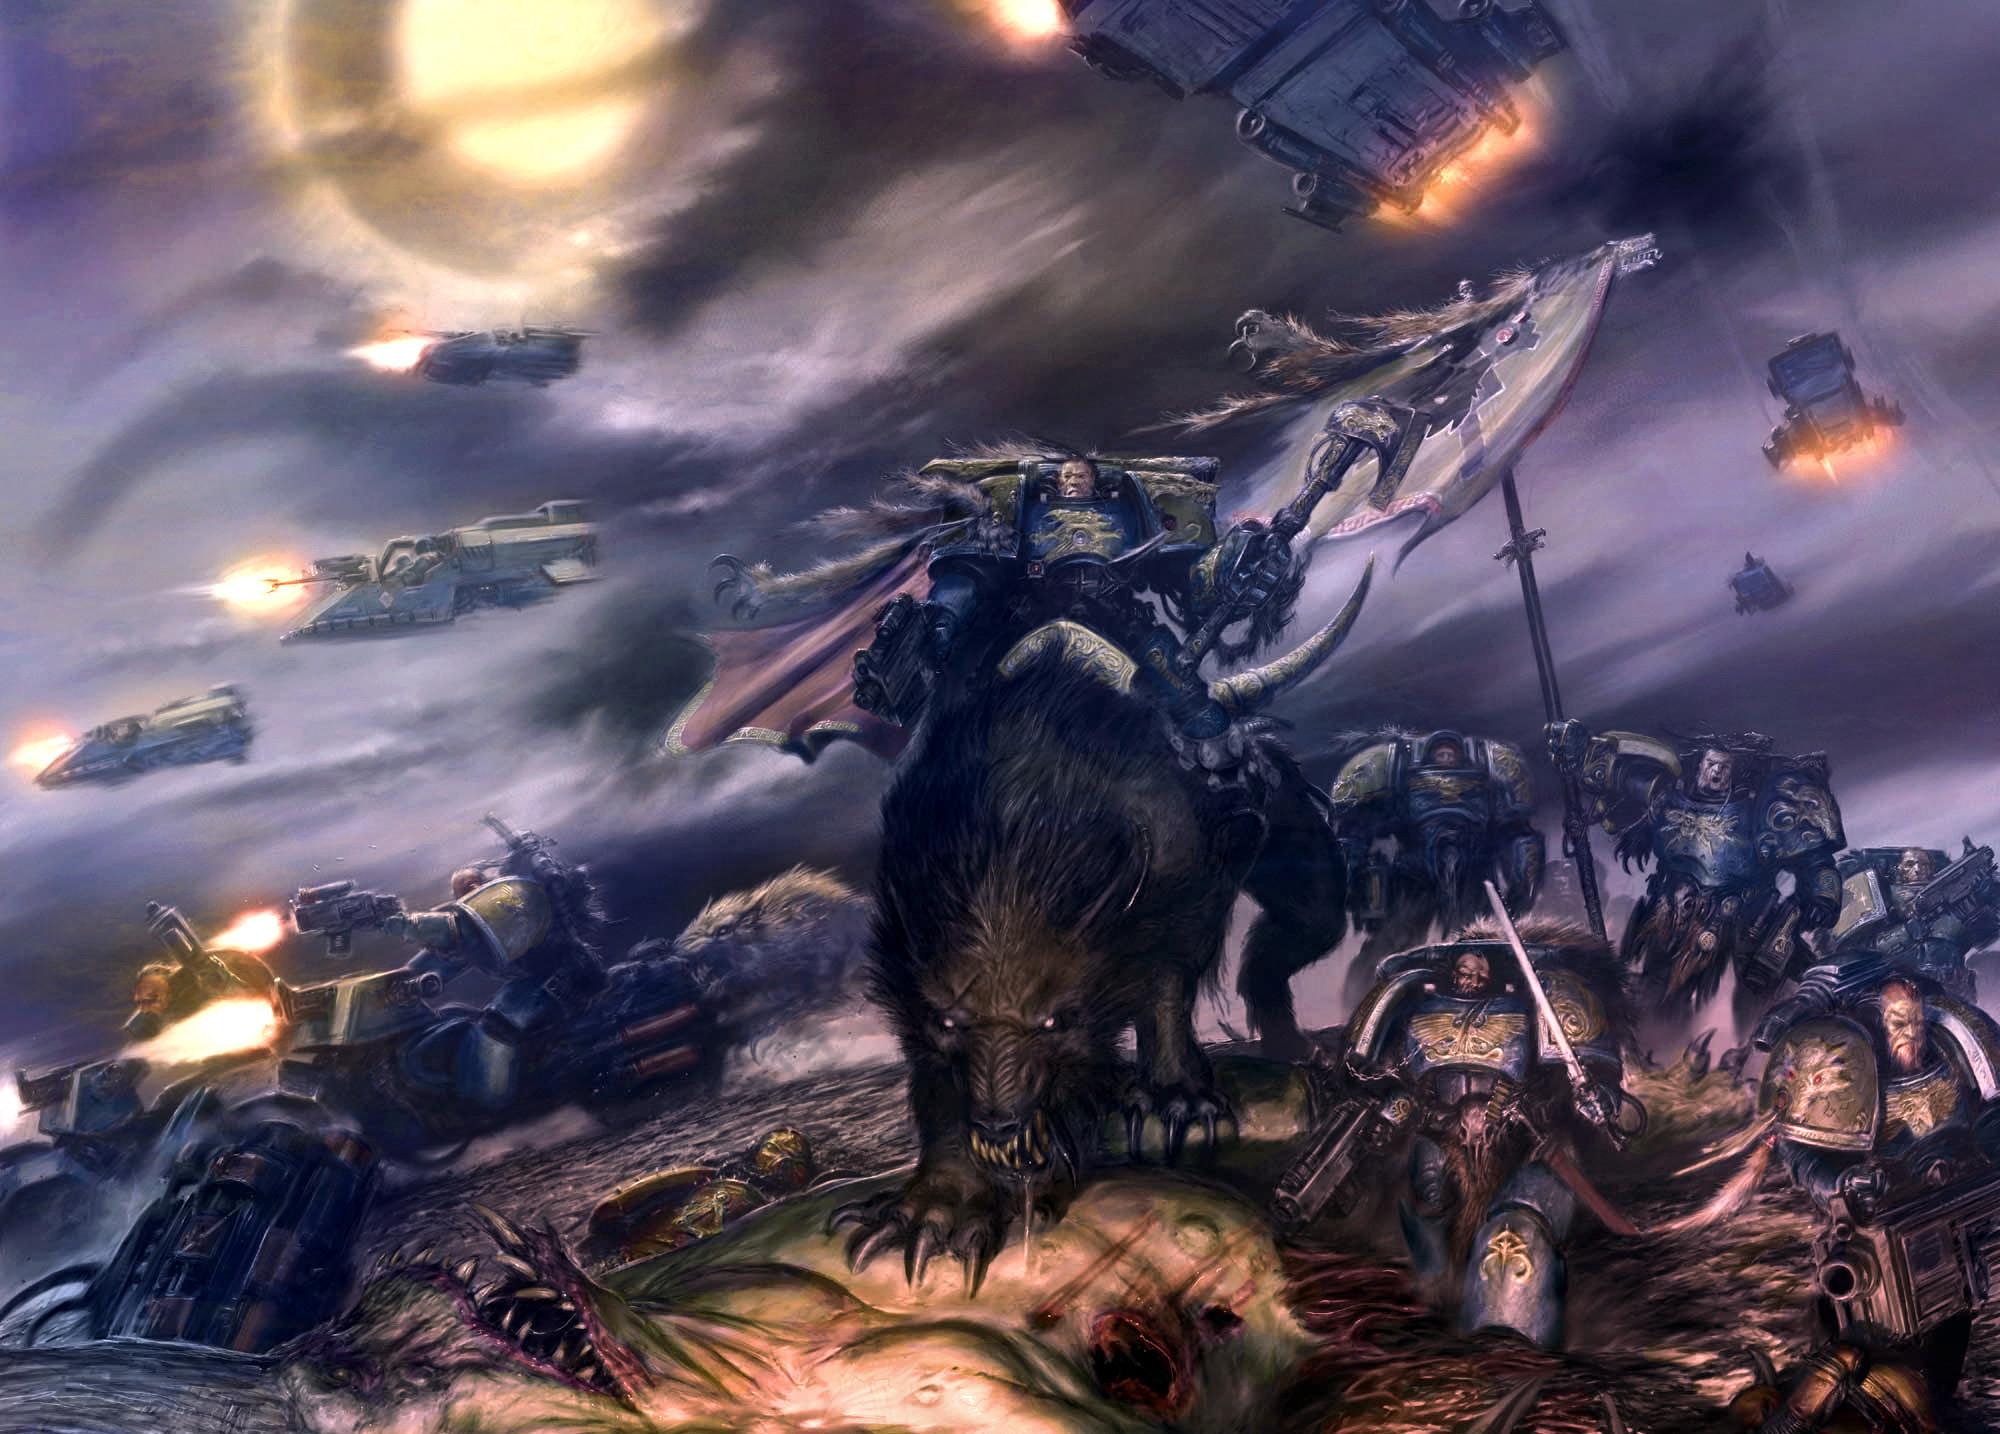 Wallpaper Warhammer 40k, space wolves, spaceship, battle desktop .